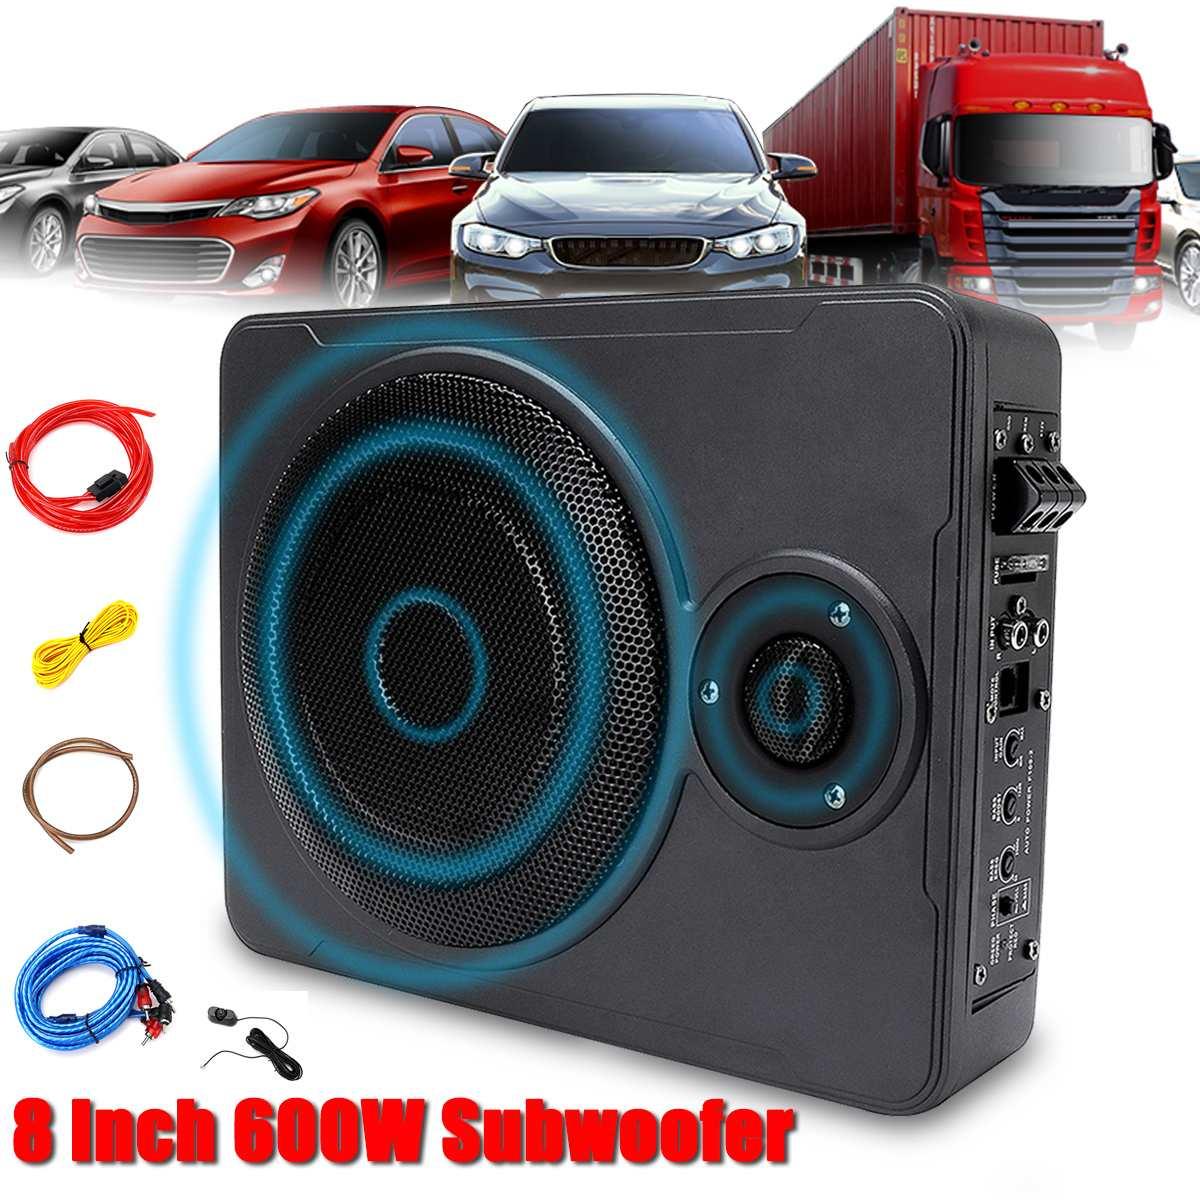 8 Inch 600W Car Home Subwoofer Under Seat SubStereo Subwoofer Car  Audio Speaker Music System Sound Car Subwoofers Speaker